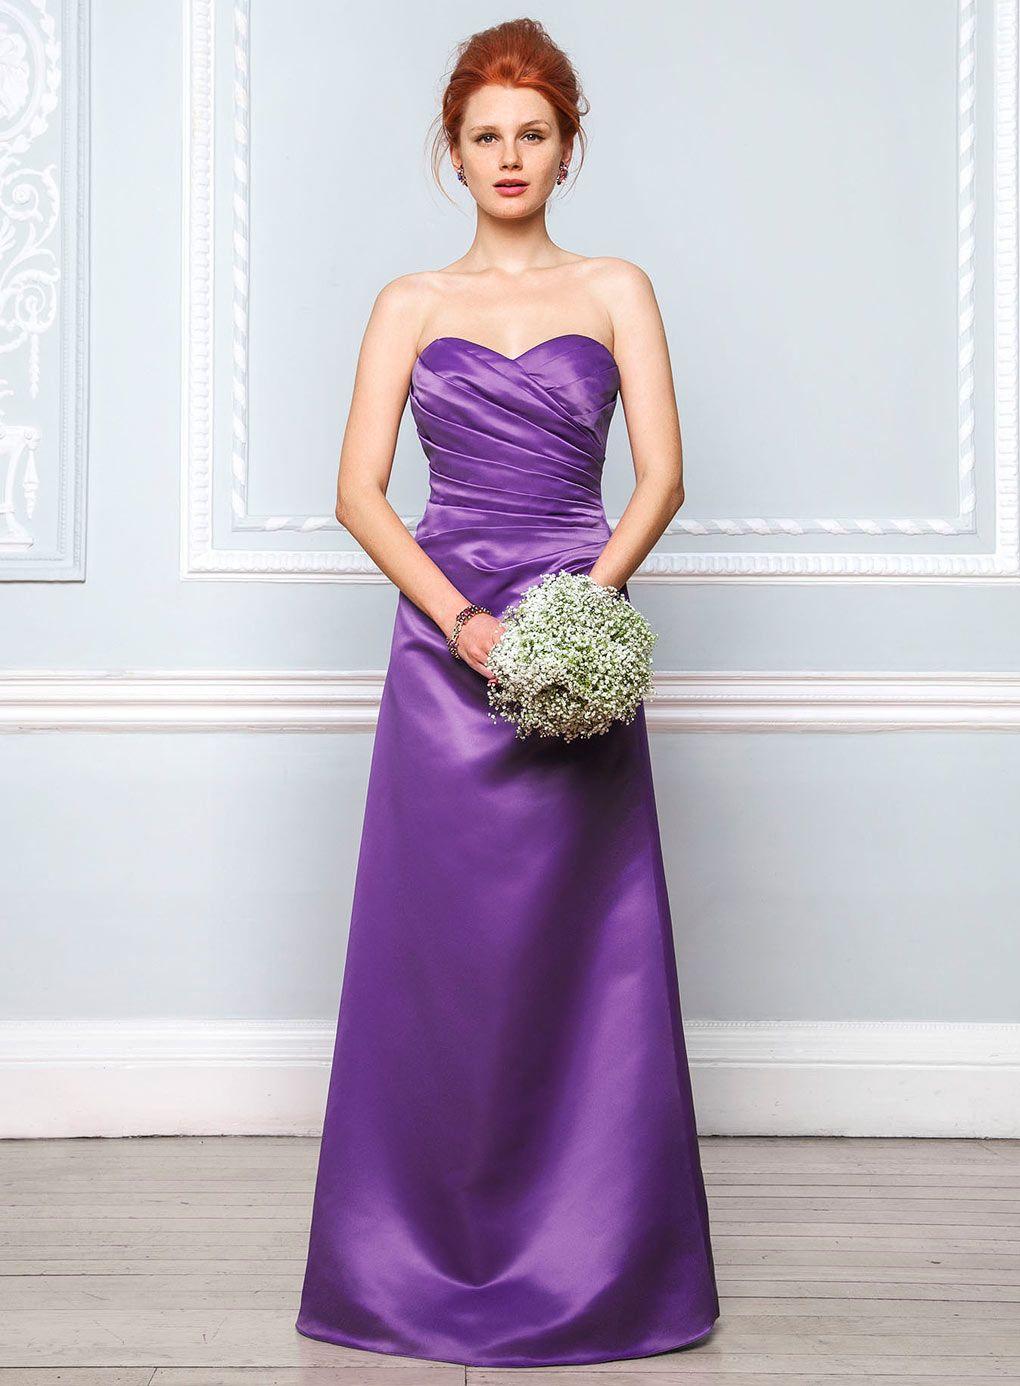 Wedding Purple Bridesmaids Dresses bridesmaid dresses purple dress pinterest purple